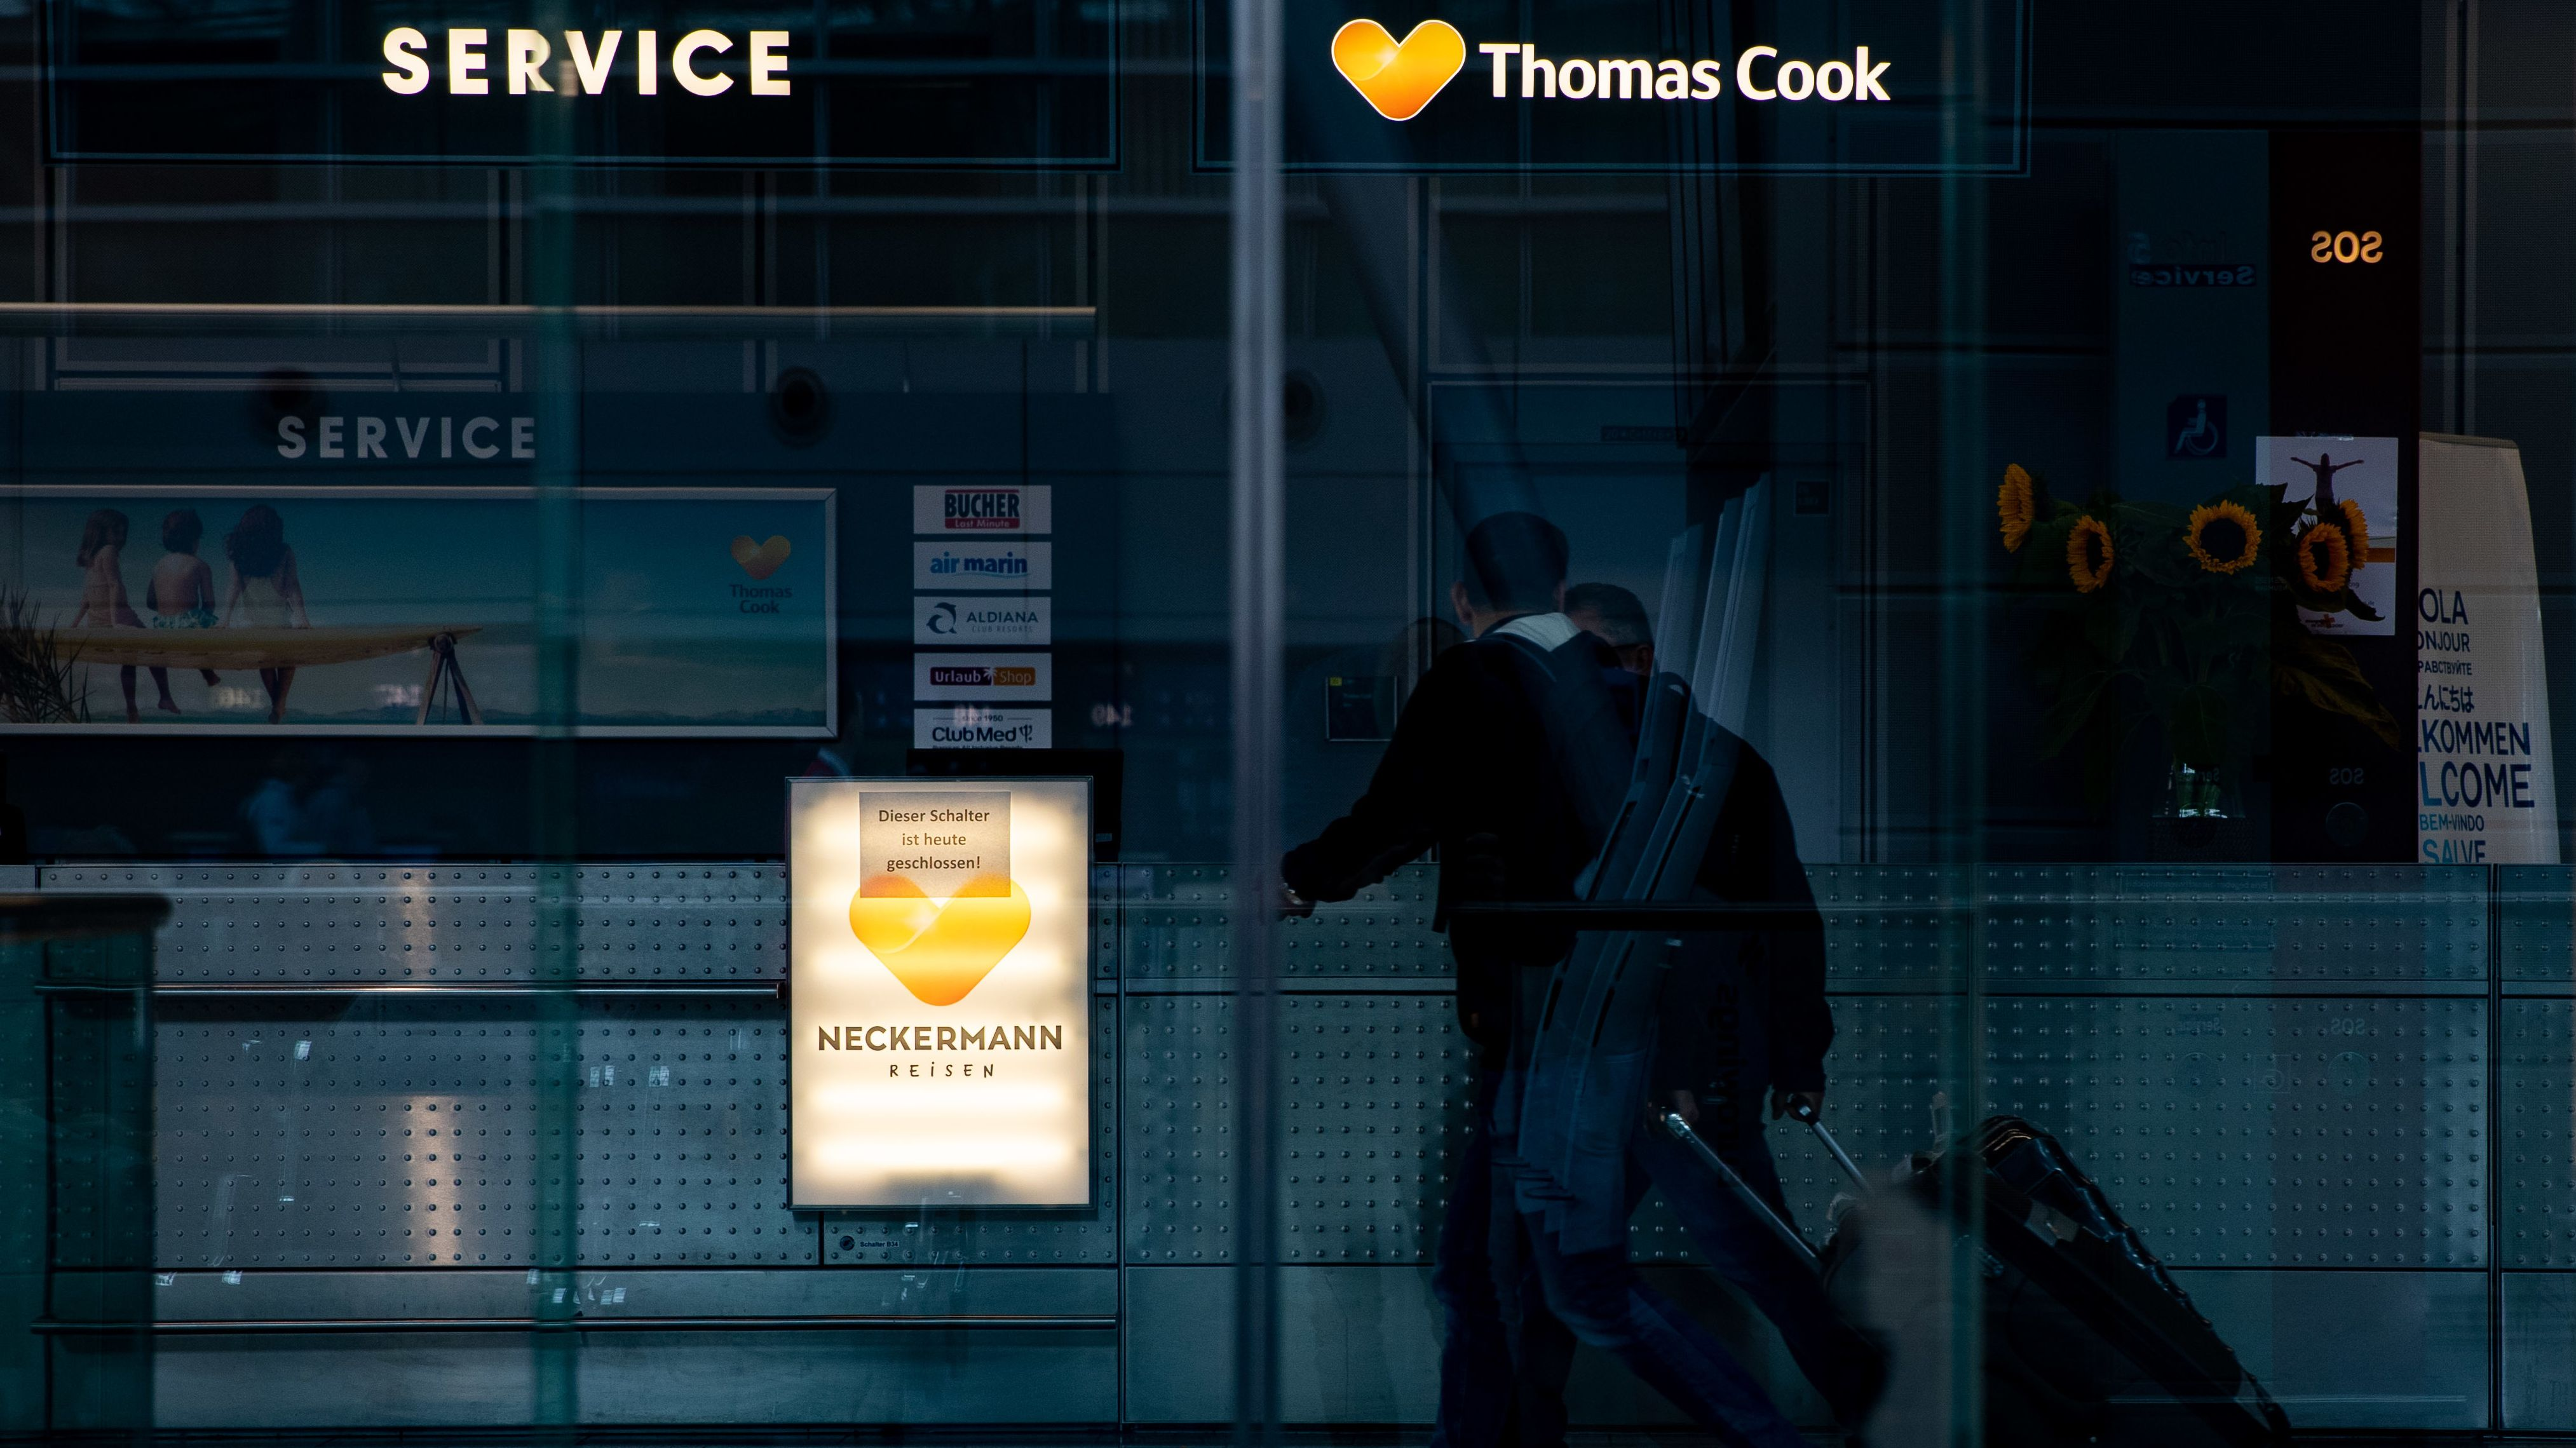 Geschlossener Thomas Cook Store